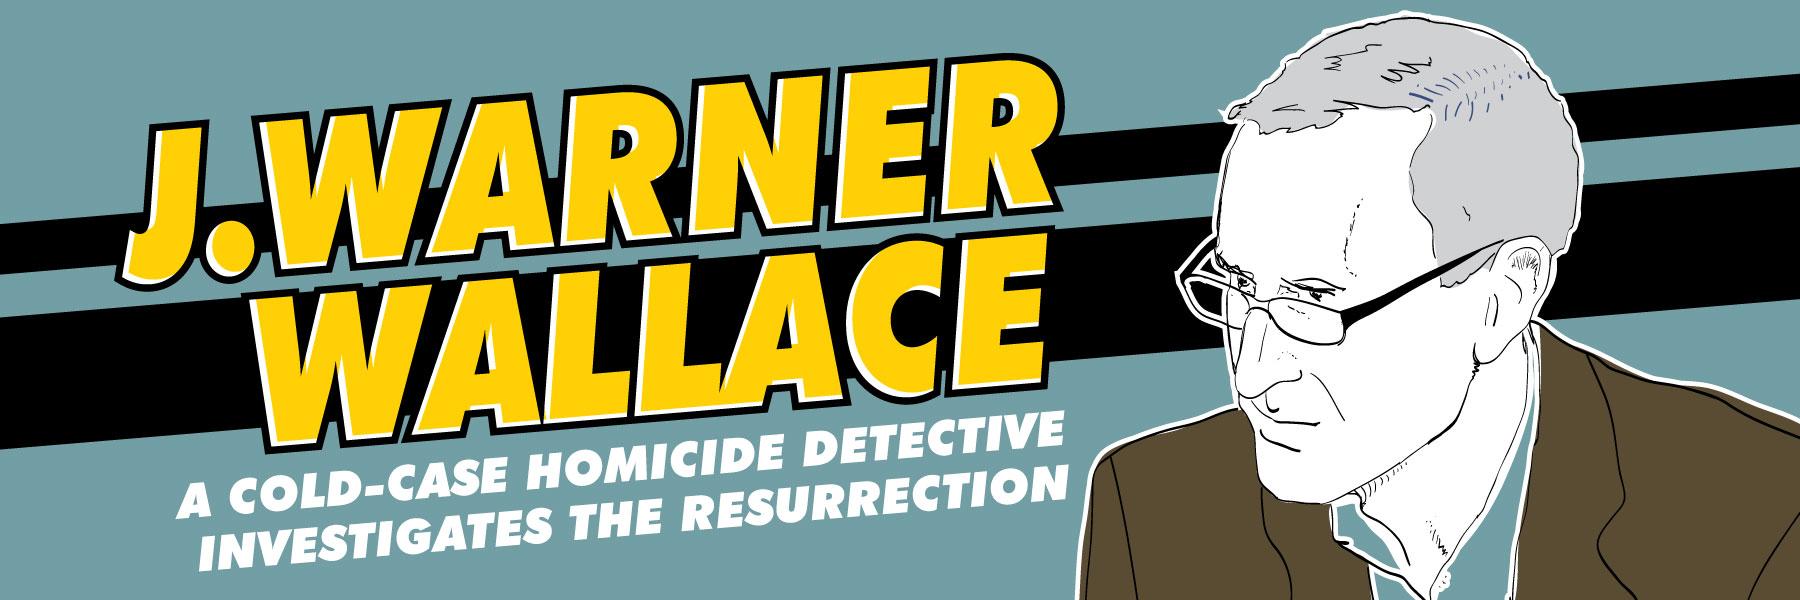 j-warner-wallace-tactical-faith-color